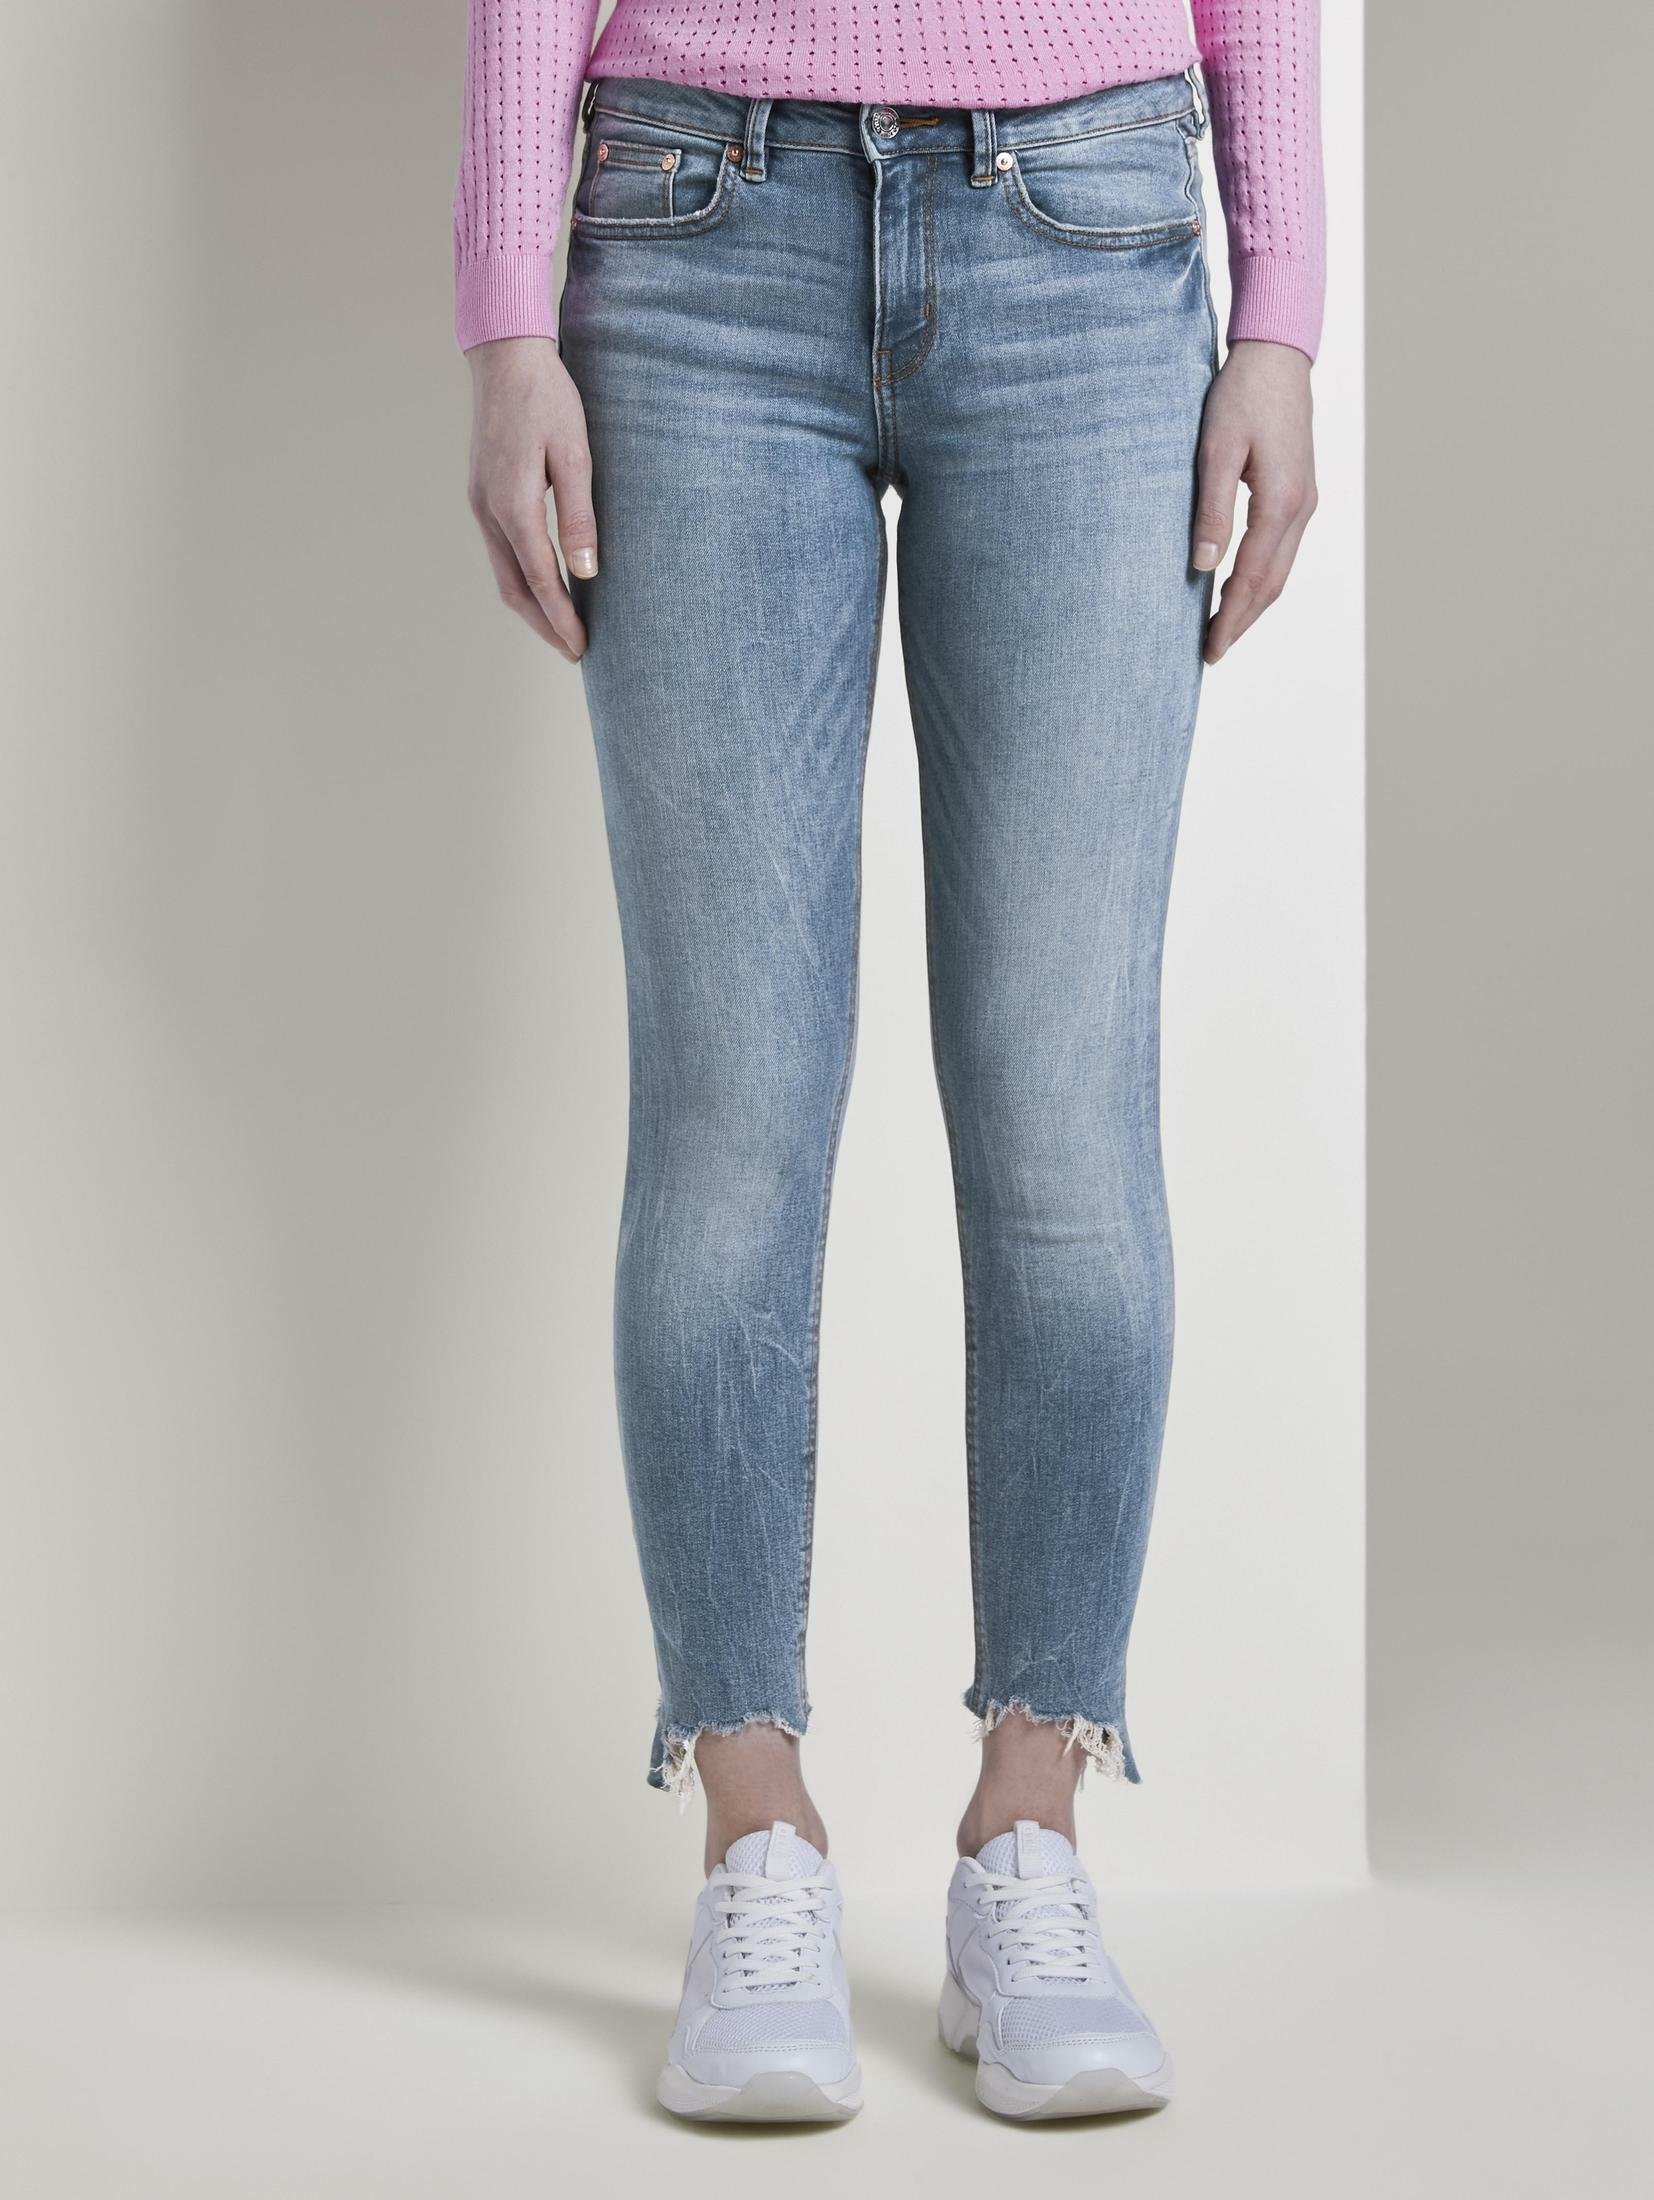 Tom Tailor Denim skinny fit jeans - gratis ruilen op otto.nl